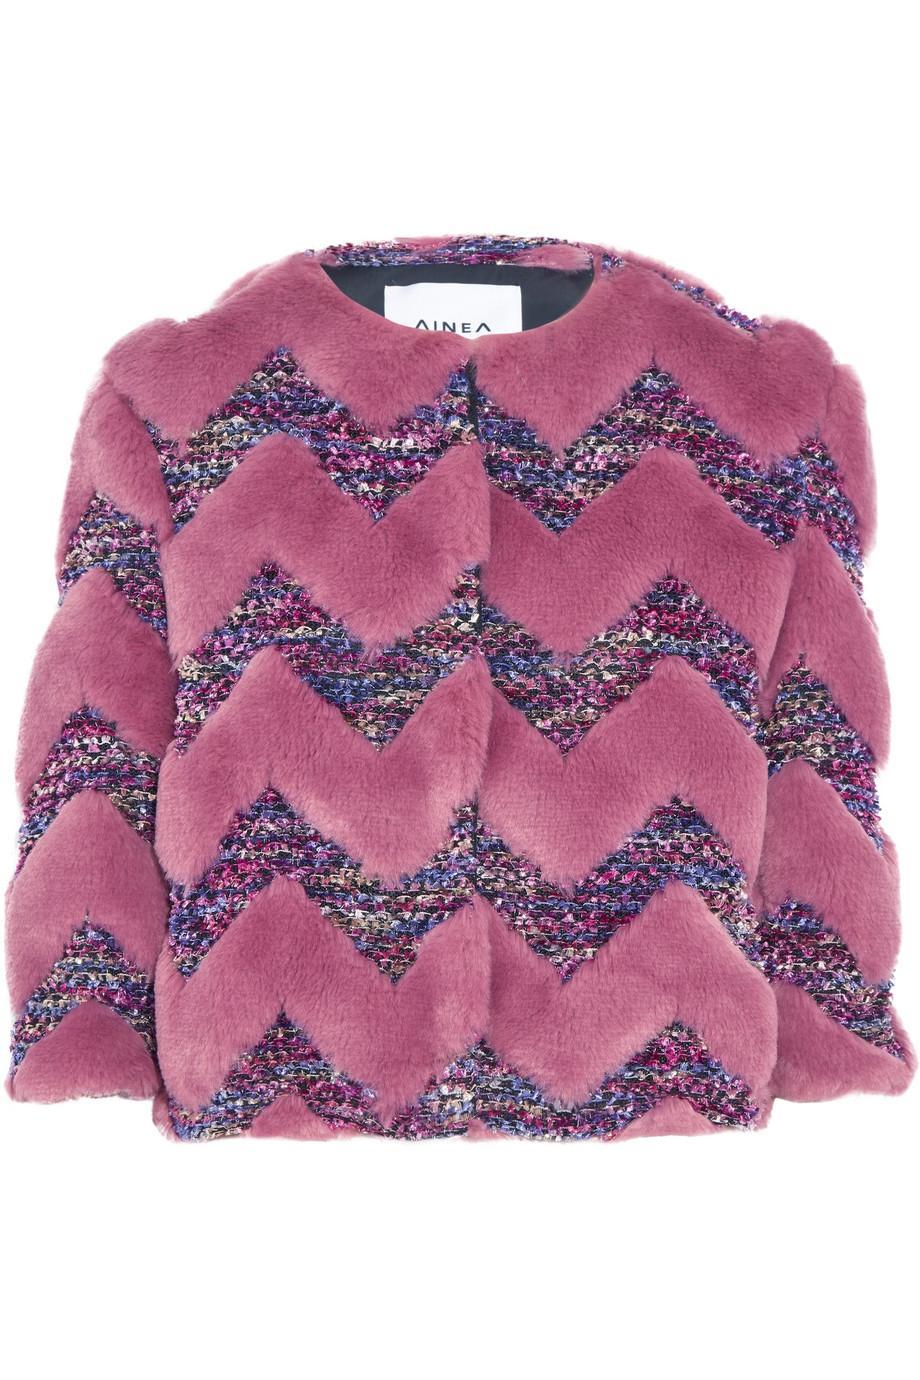 Ainea Woman Cropped Faux Fur And Bouclé Jacket Pastel Pink